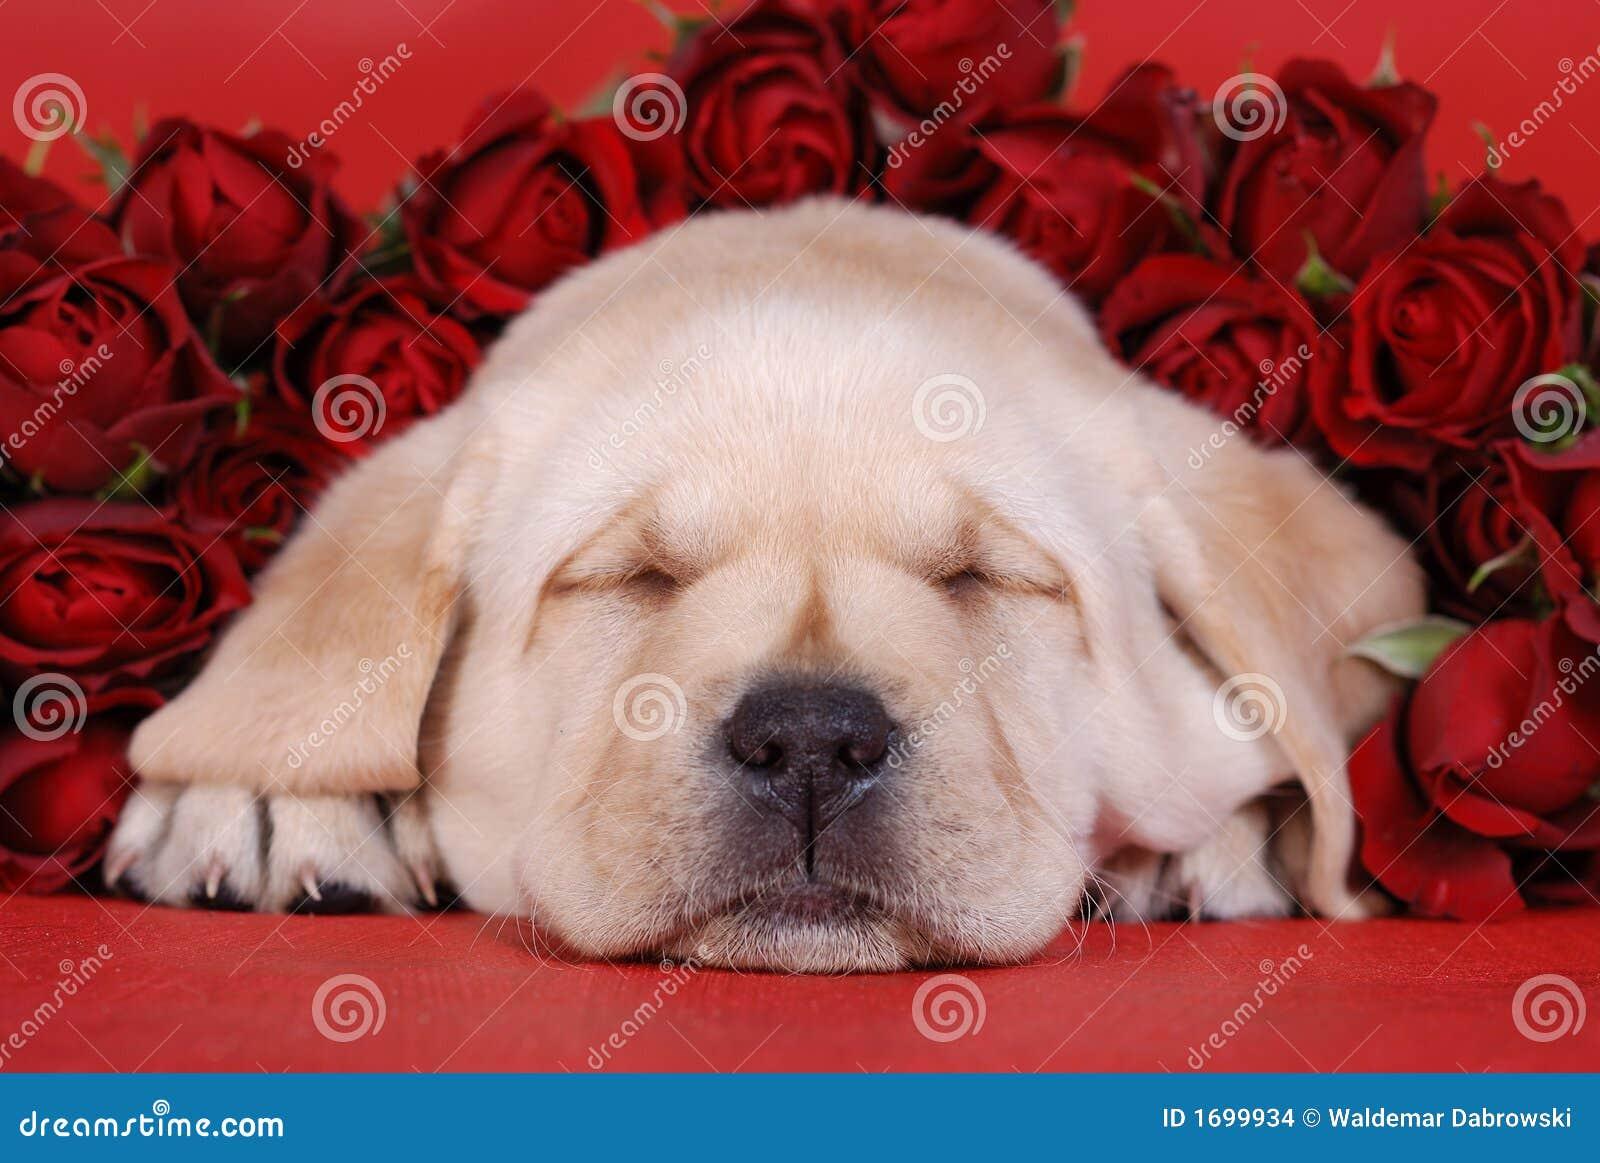 Cucciolo di sonno Labrador con la r